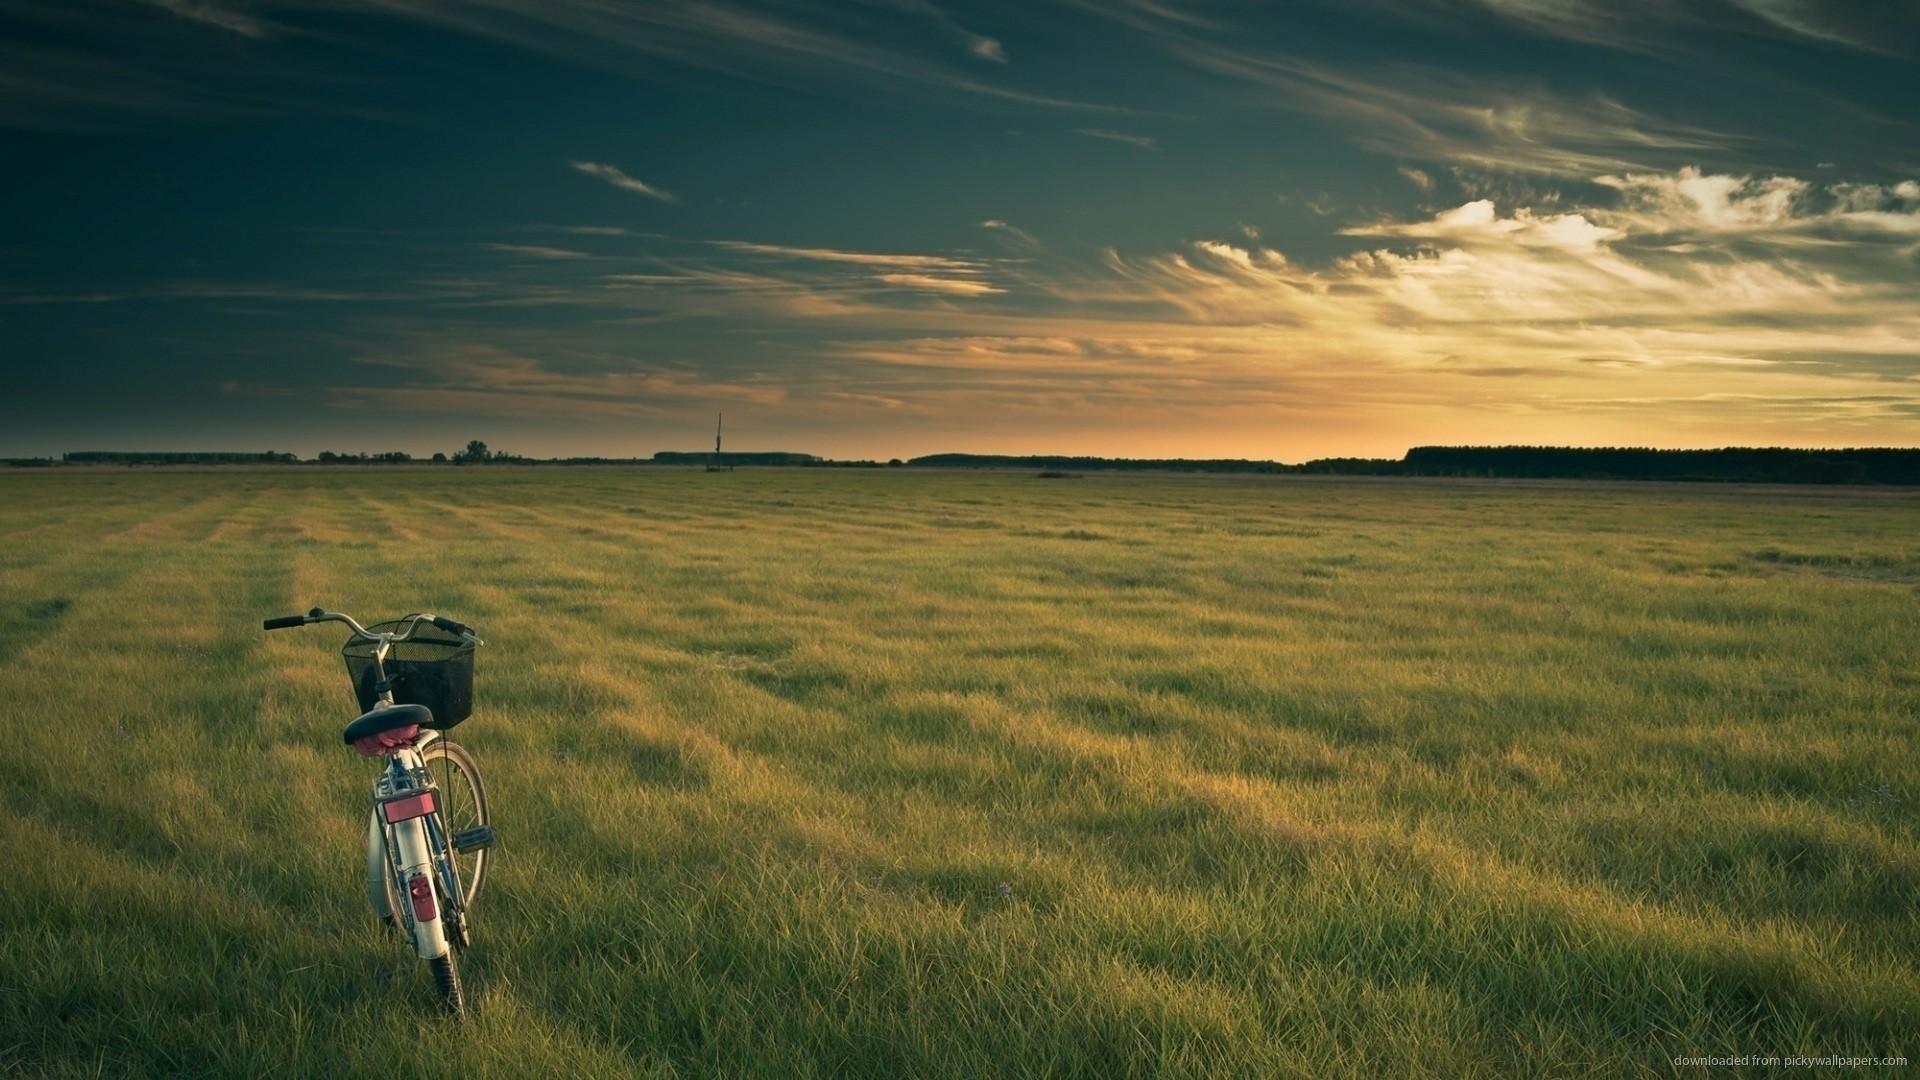 Bicycle In Open Field Desktop Wallpaper picture